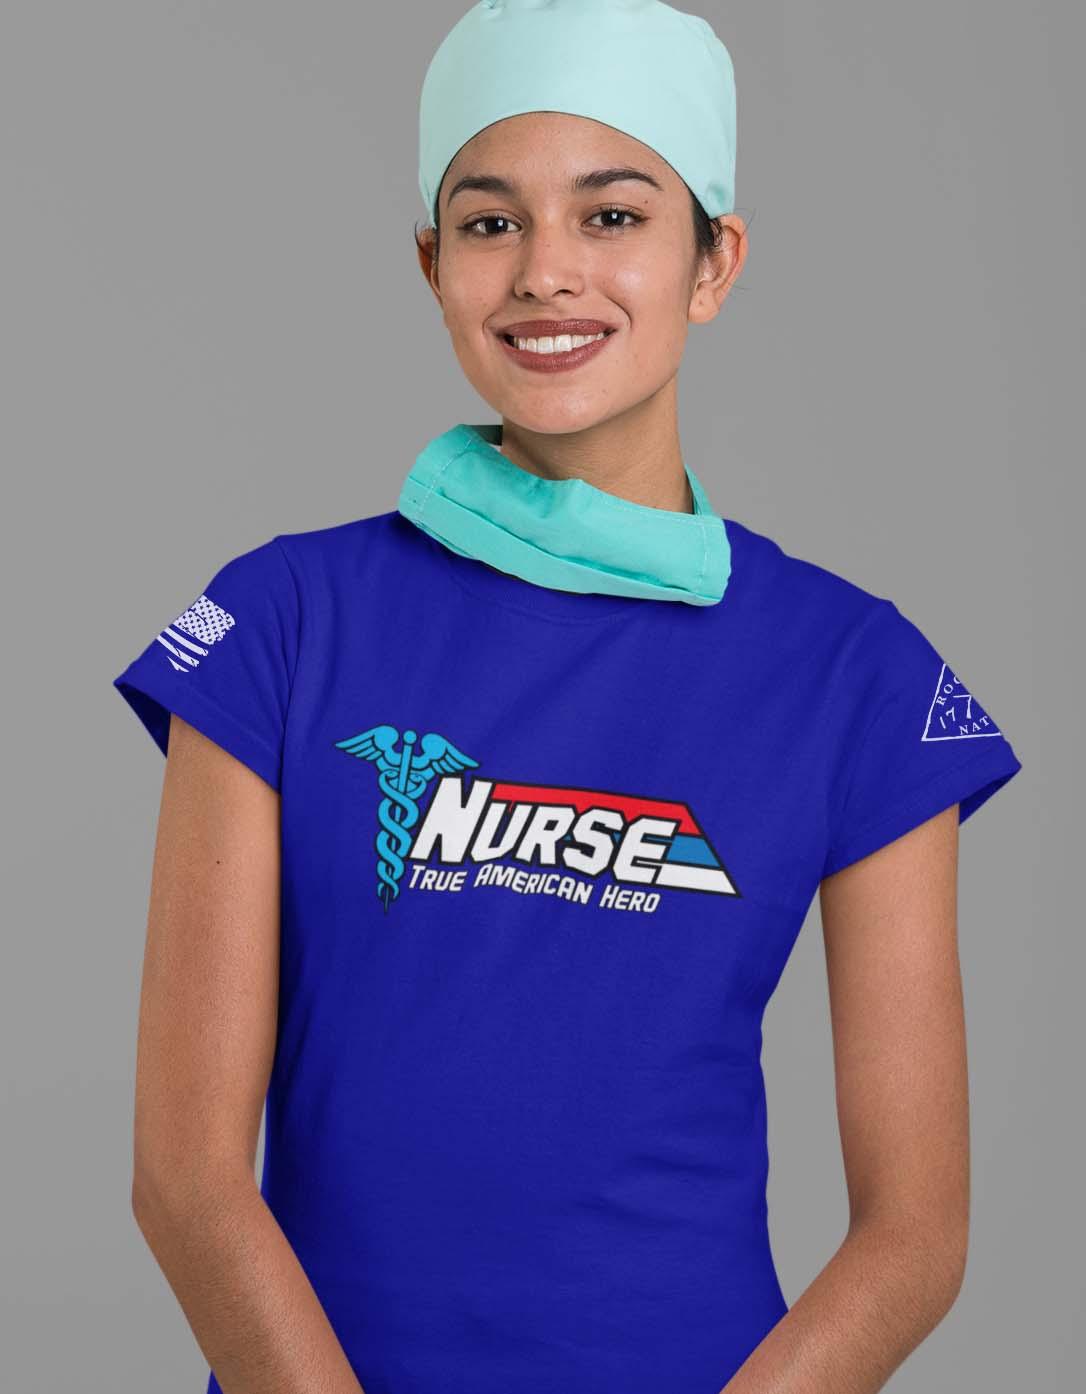 Nurse-True American Hero on women's royal blue t-shirt